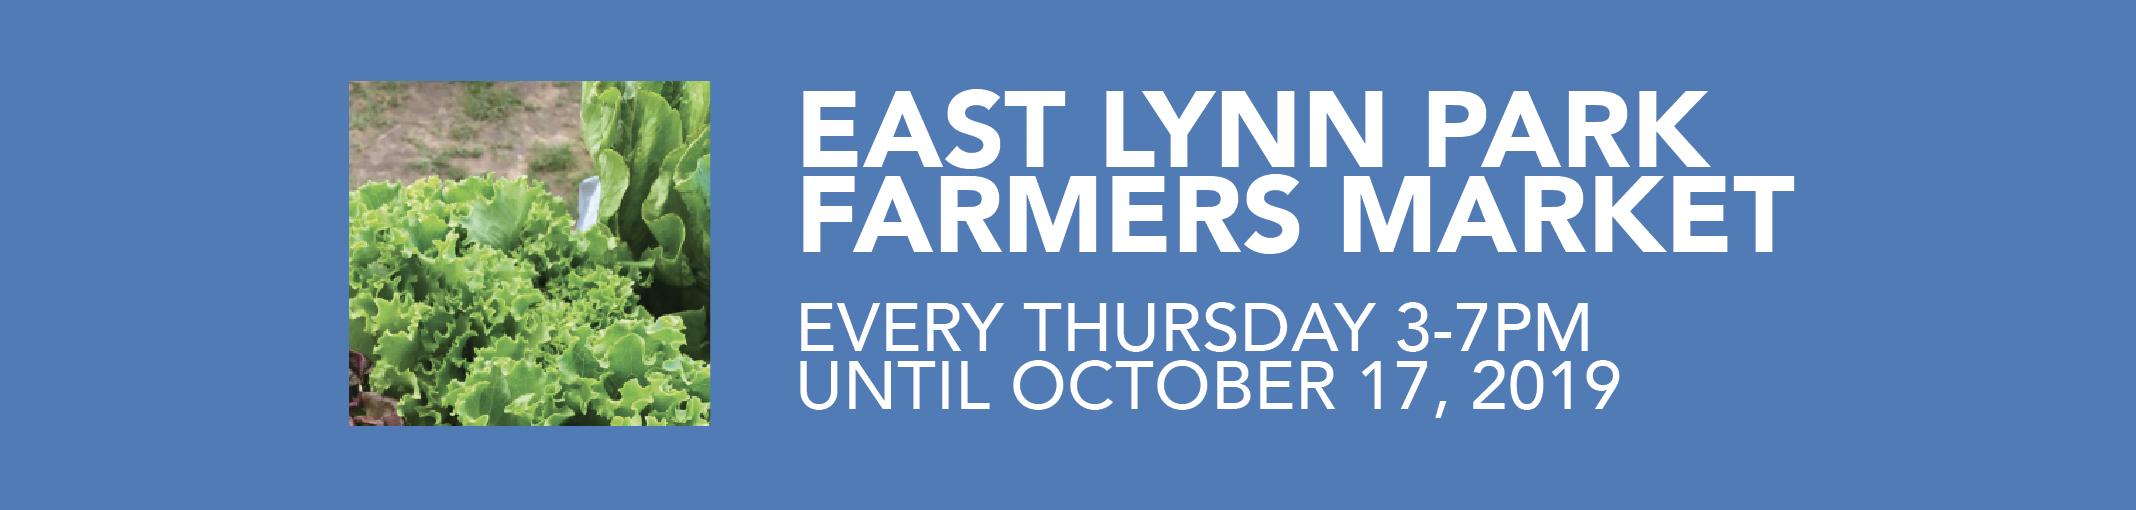 East Lynn Park Farmers Market